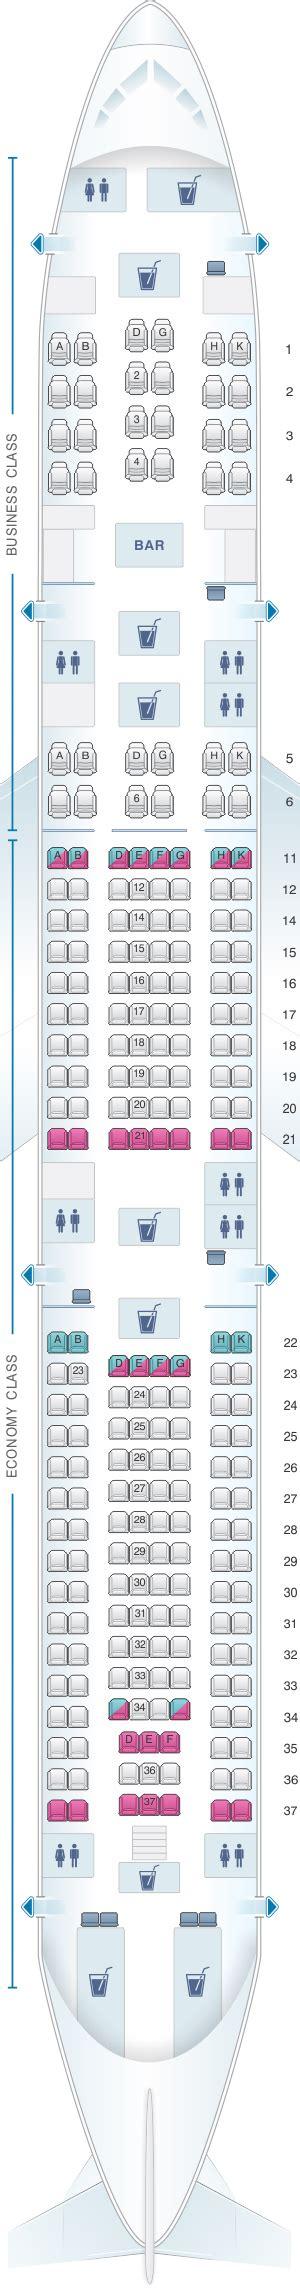 iberia airbus a340 500 seat map plan de cabine airbus a340 500 seatmaestro fr